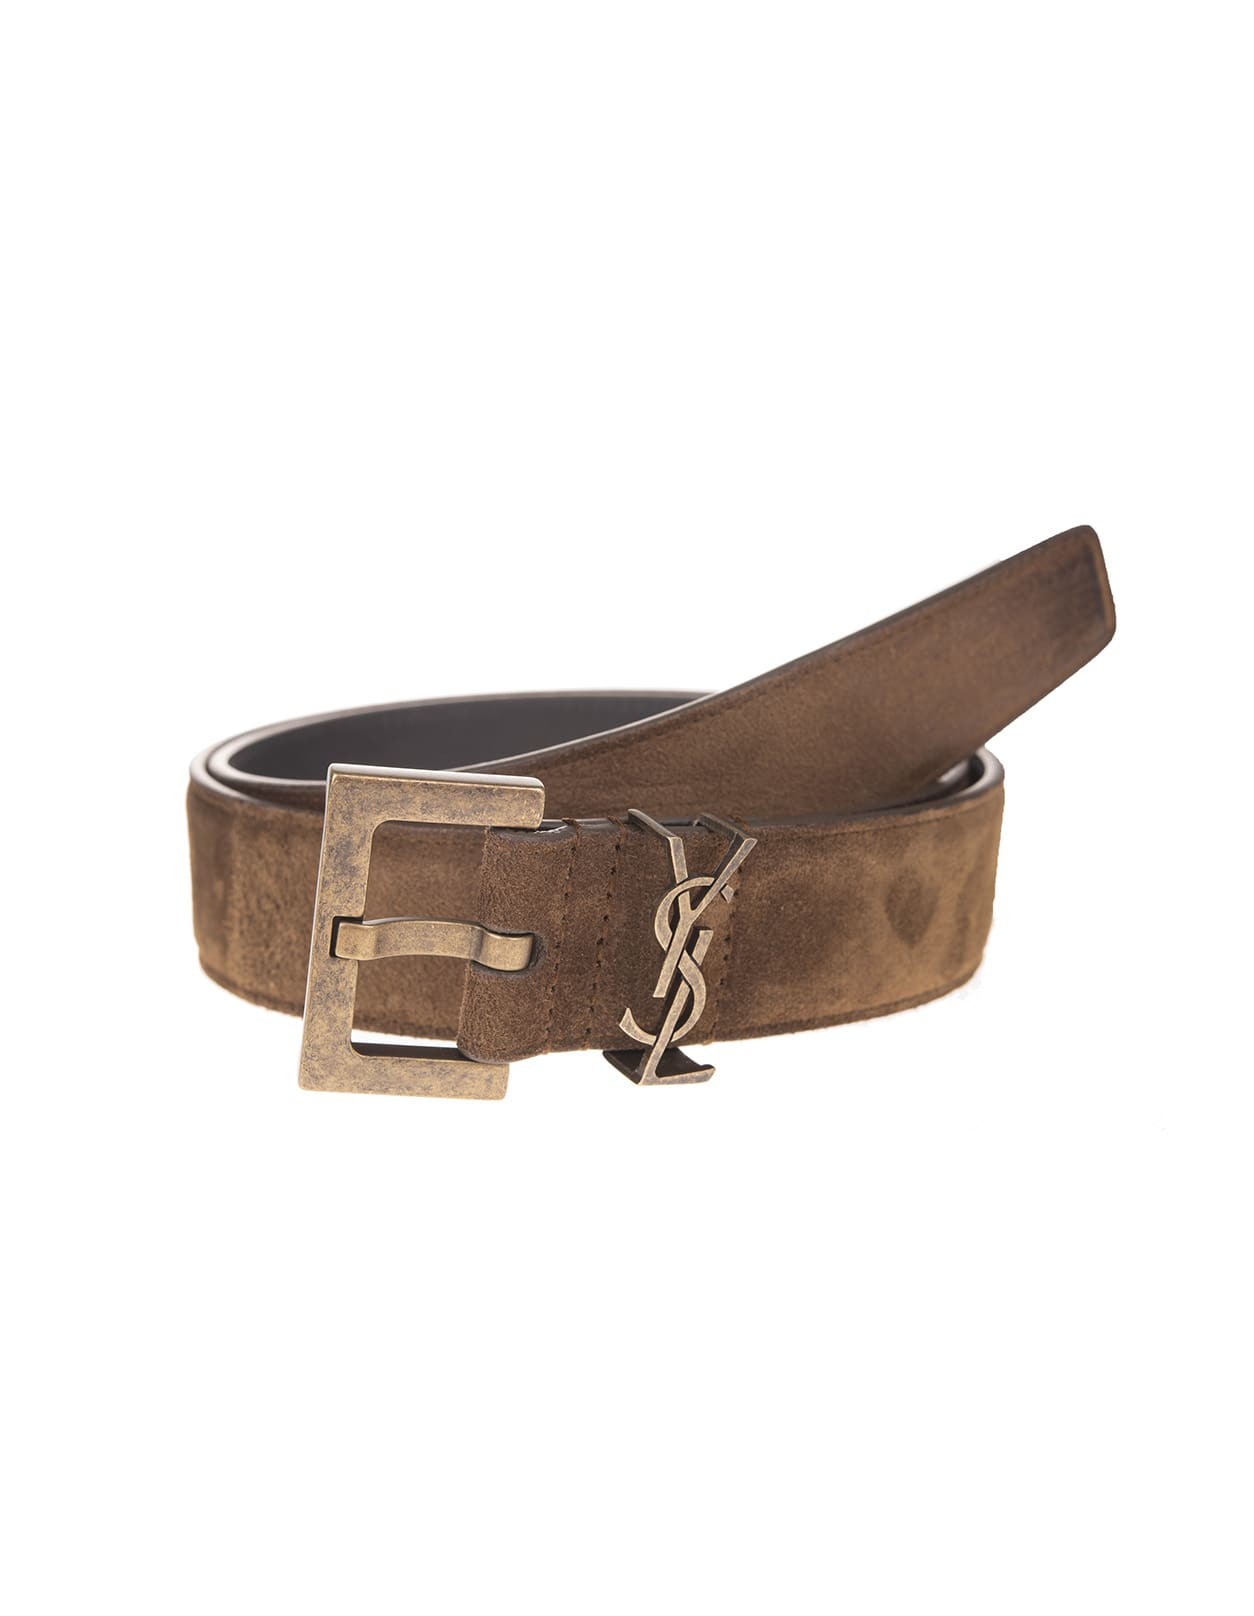 Monogram Woman Belt In Light Brown Suede